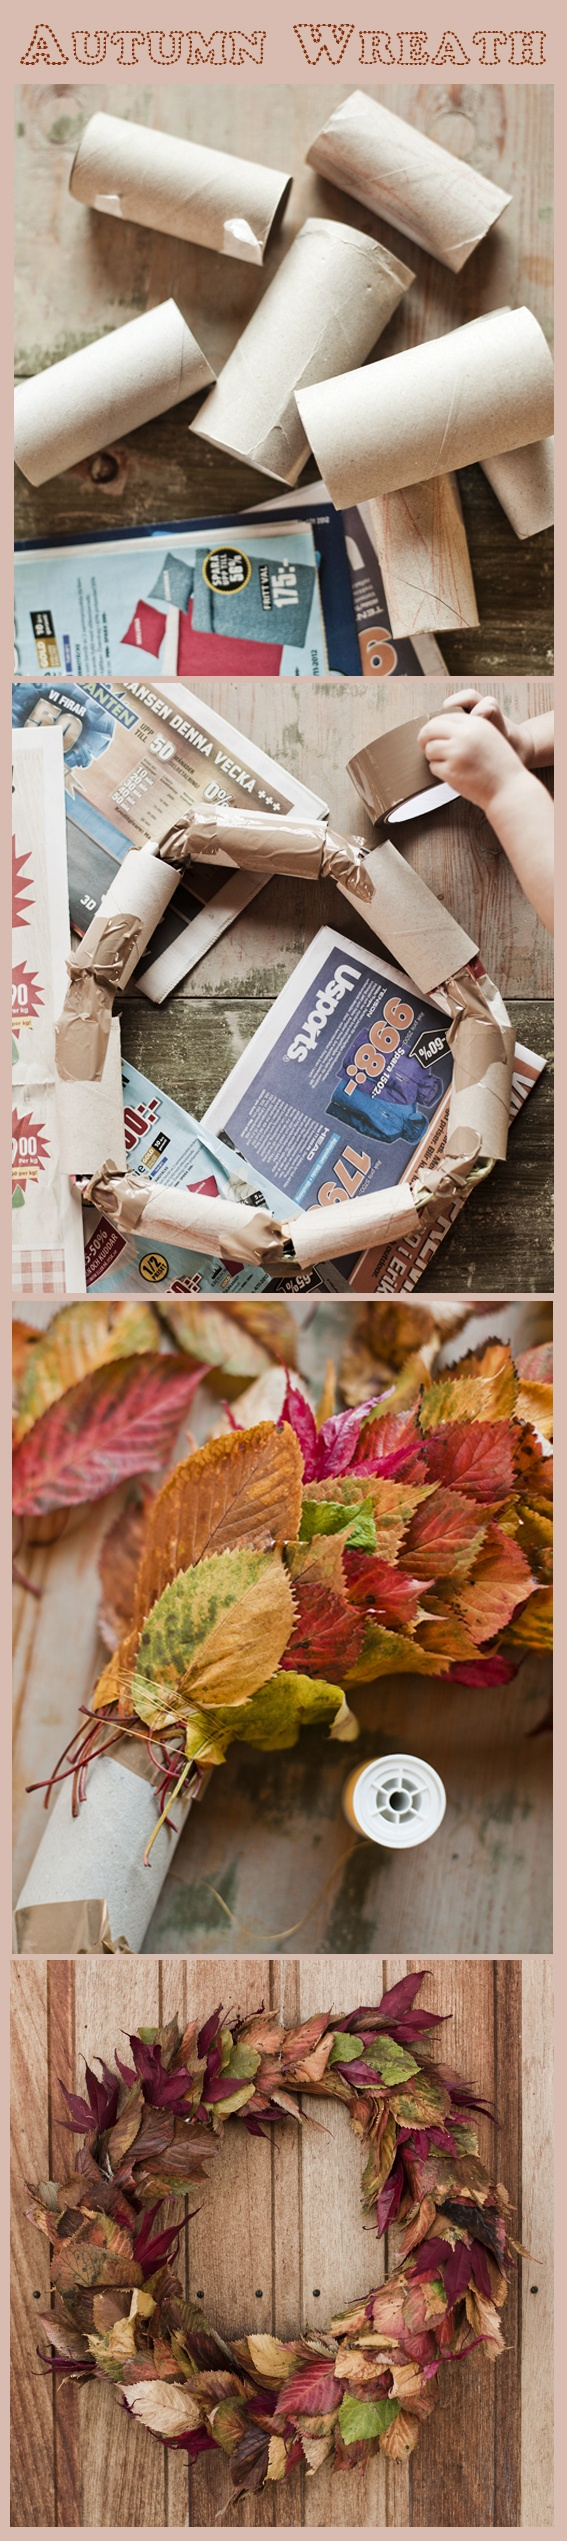 An easy way to make a beautiful autumn wreath. DIY wreath. Photo: Lina Östling